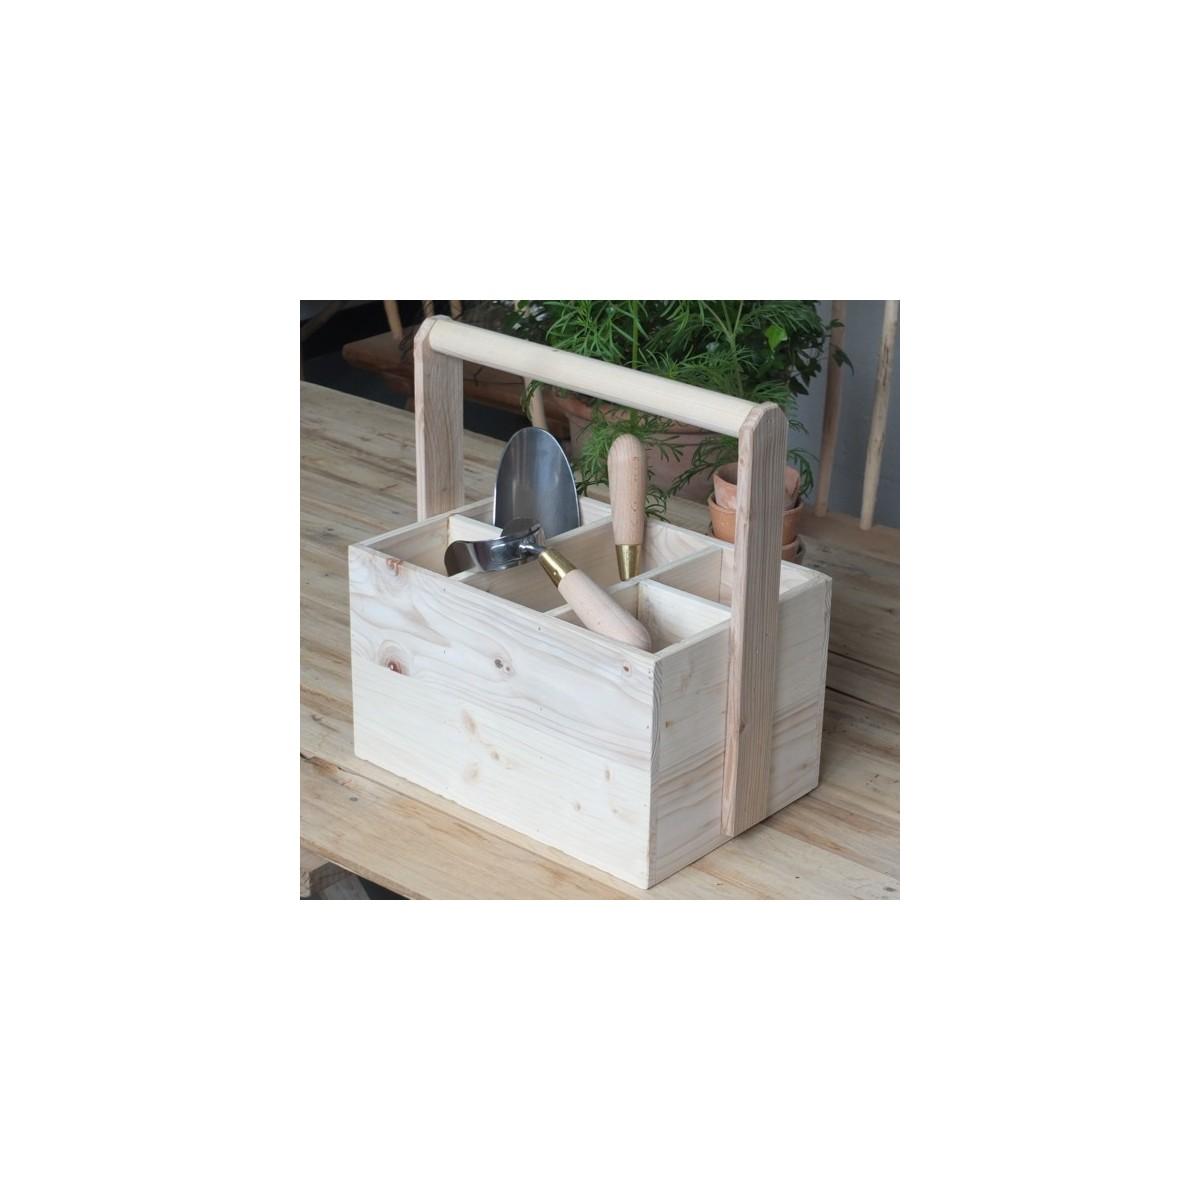 caisse outils de jardin lamarck botanique editions atelier du jardinier botanique editions. Black Bedroom Furniture Sets. Home Design Ideas